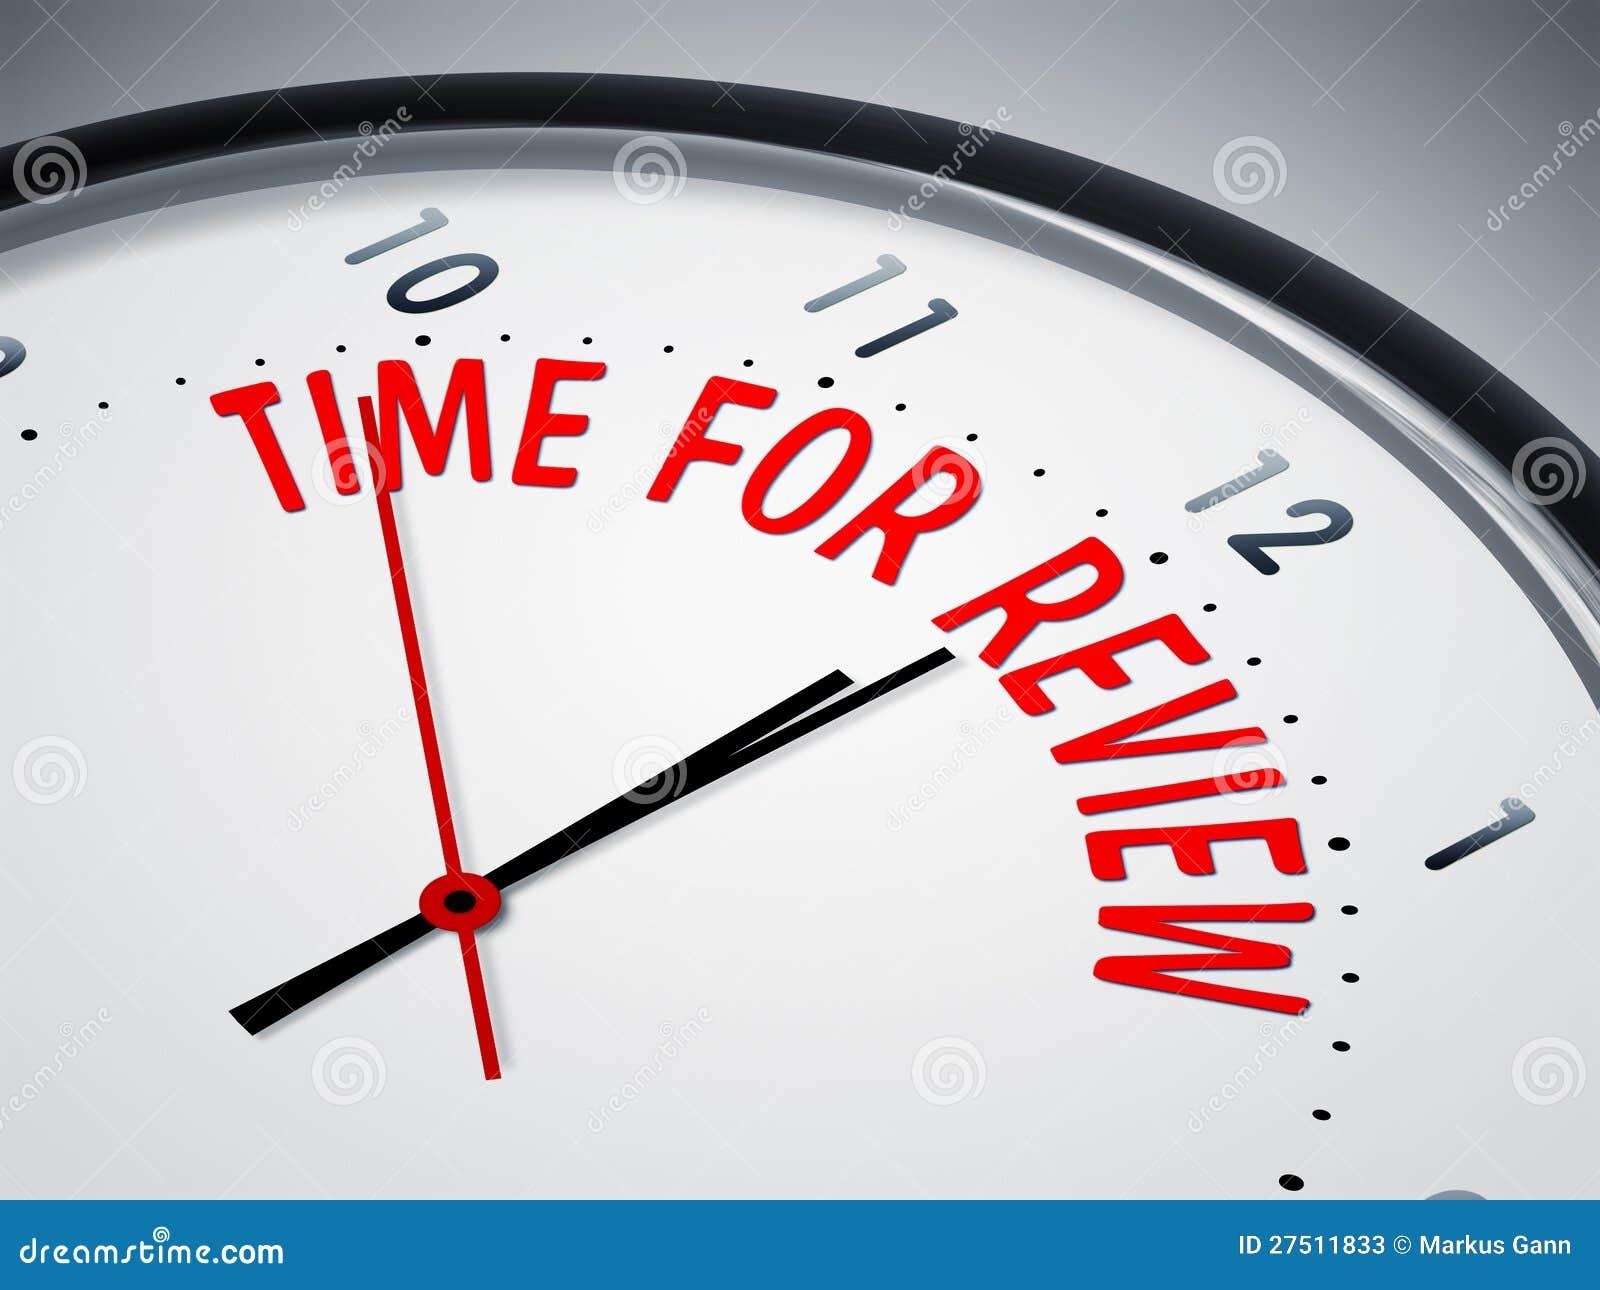 times reviews